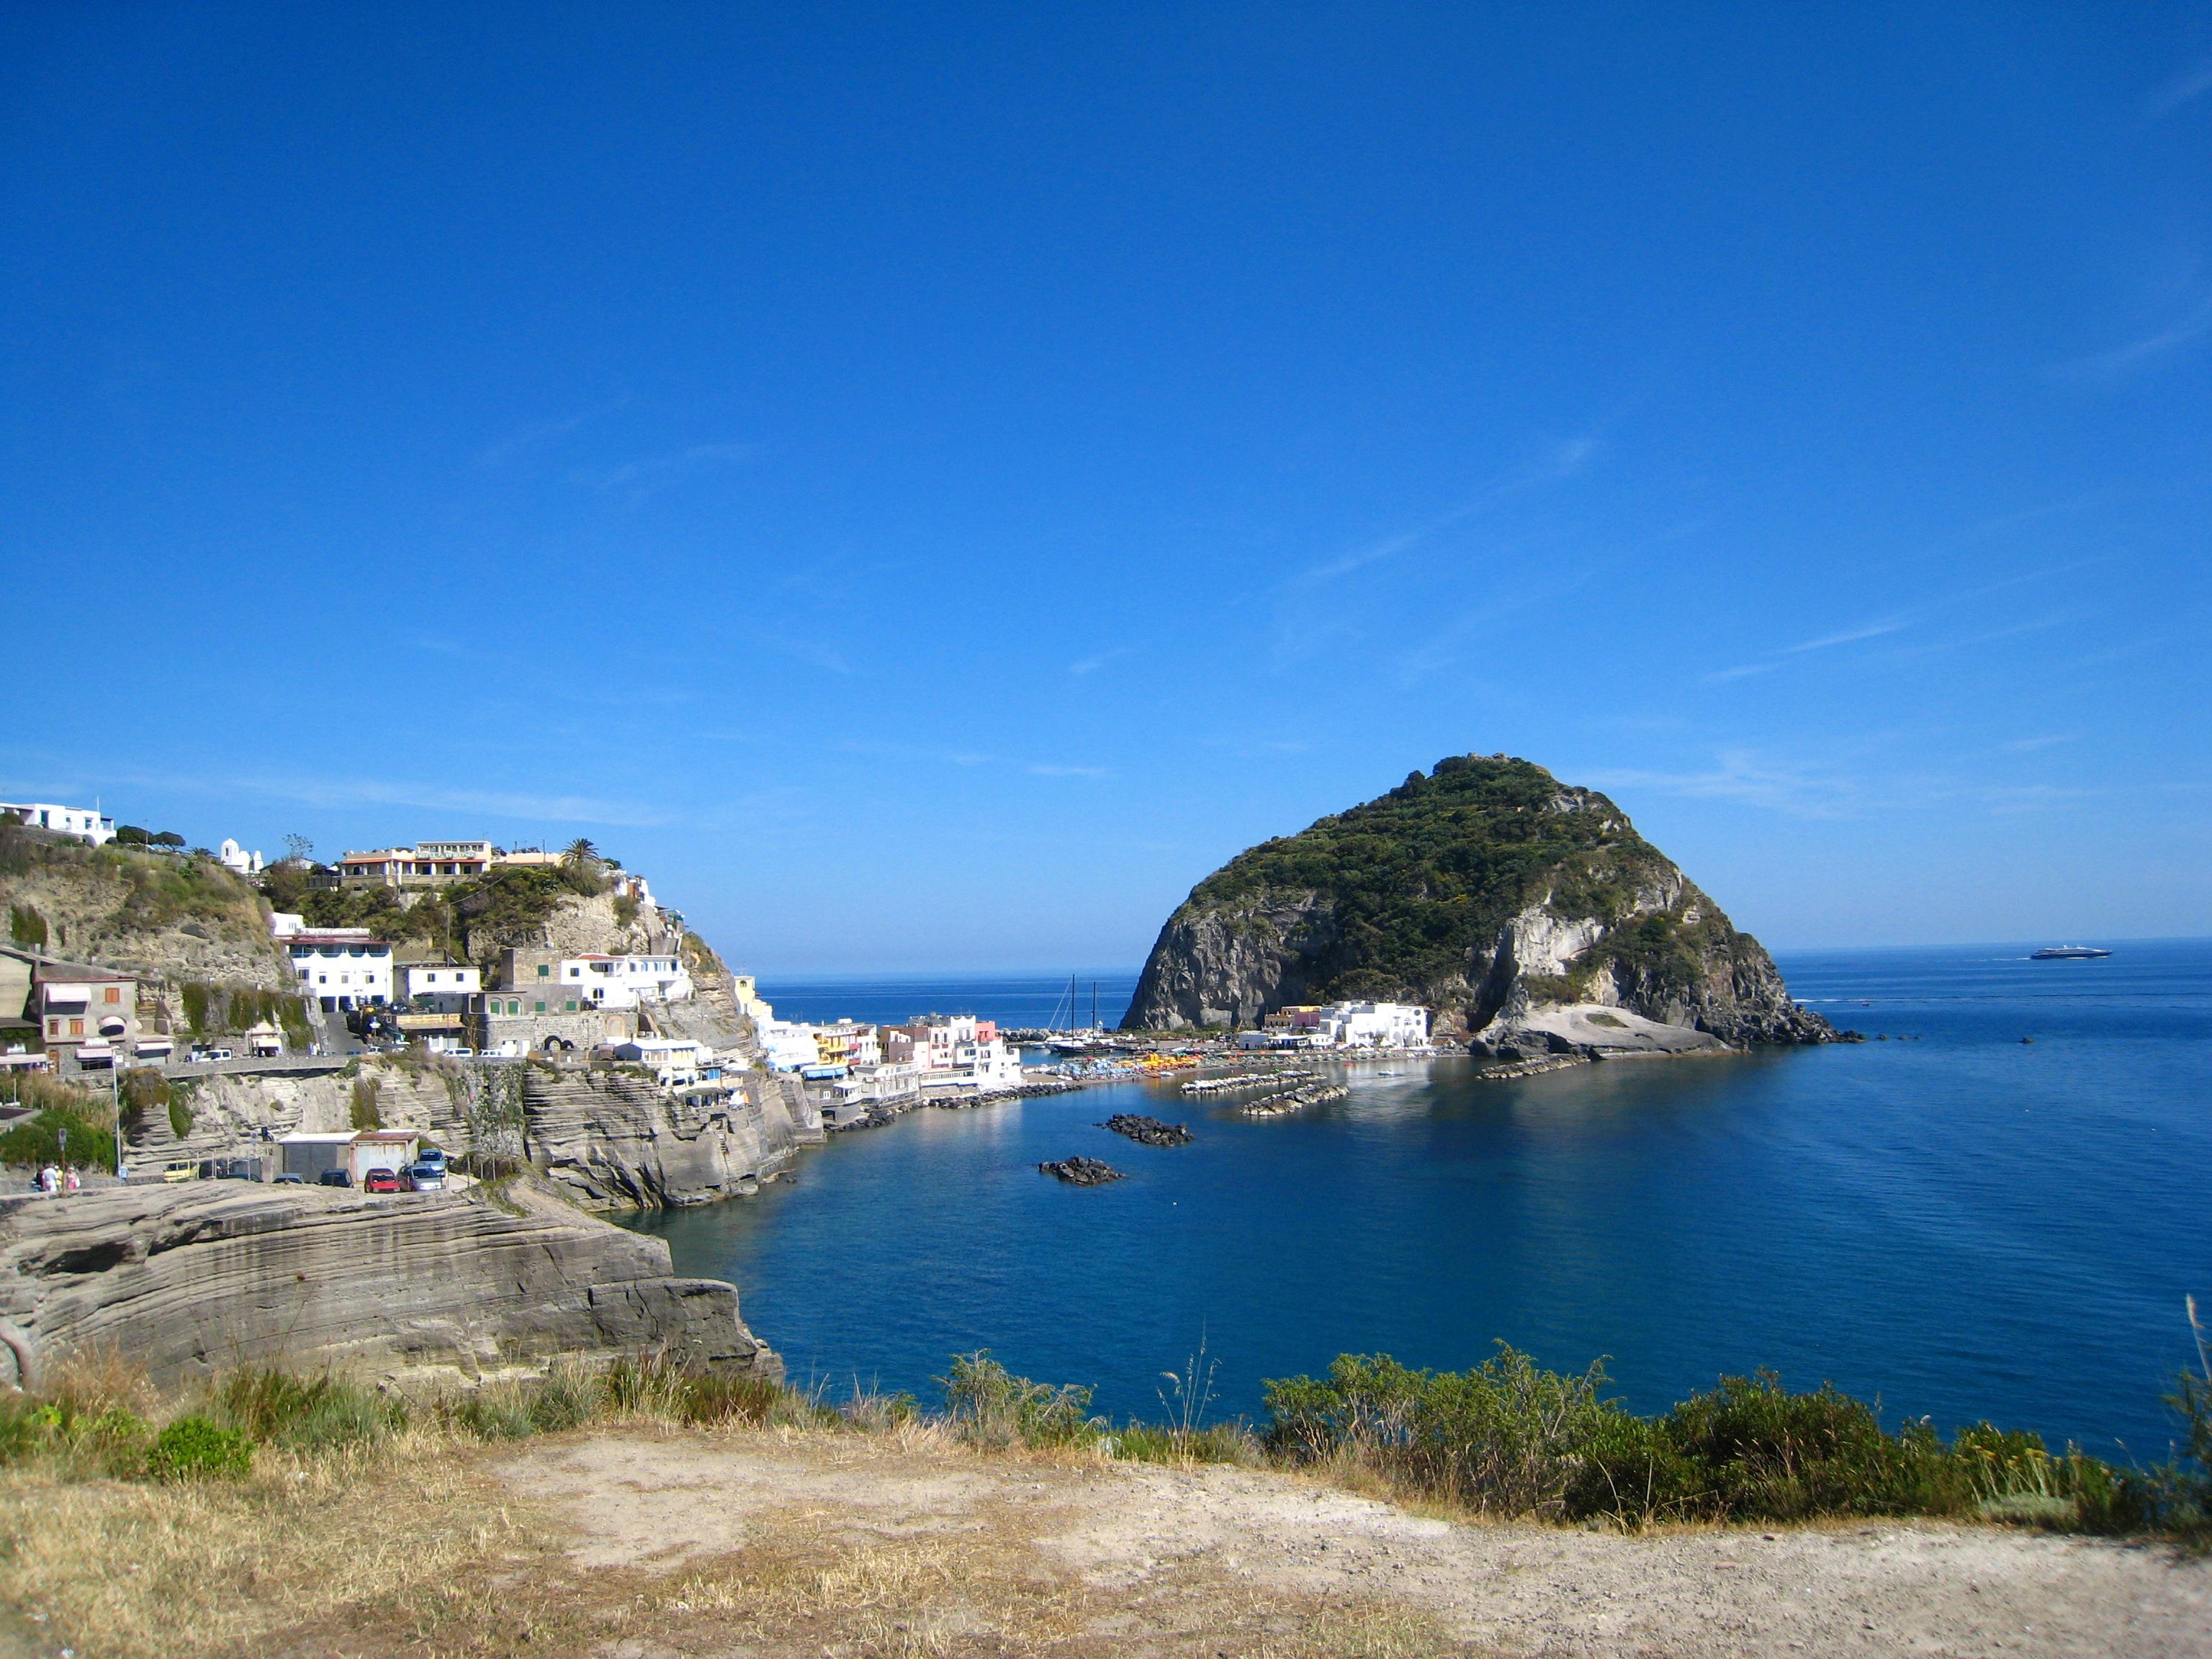 Noleggio Barche Sant'Angelo d'Ischia - Navalia | Noleggia un Sogno